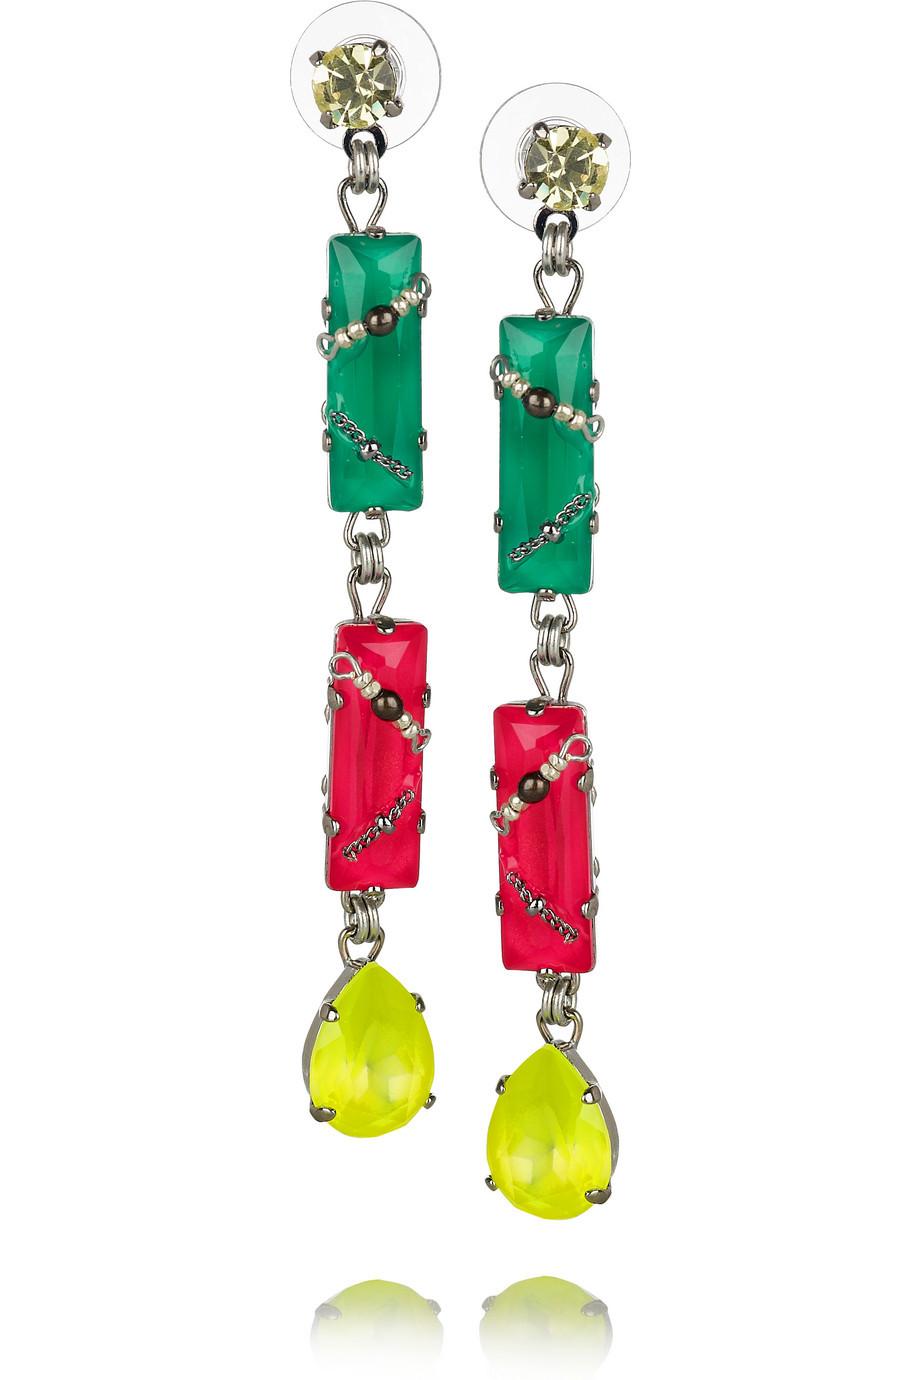 Neon-bridal-earrings-for-a-vibrant-white-aisle-look-1.full